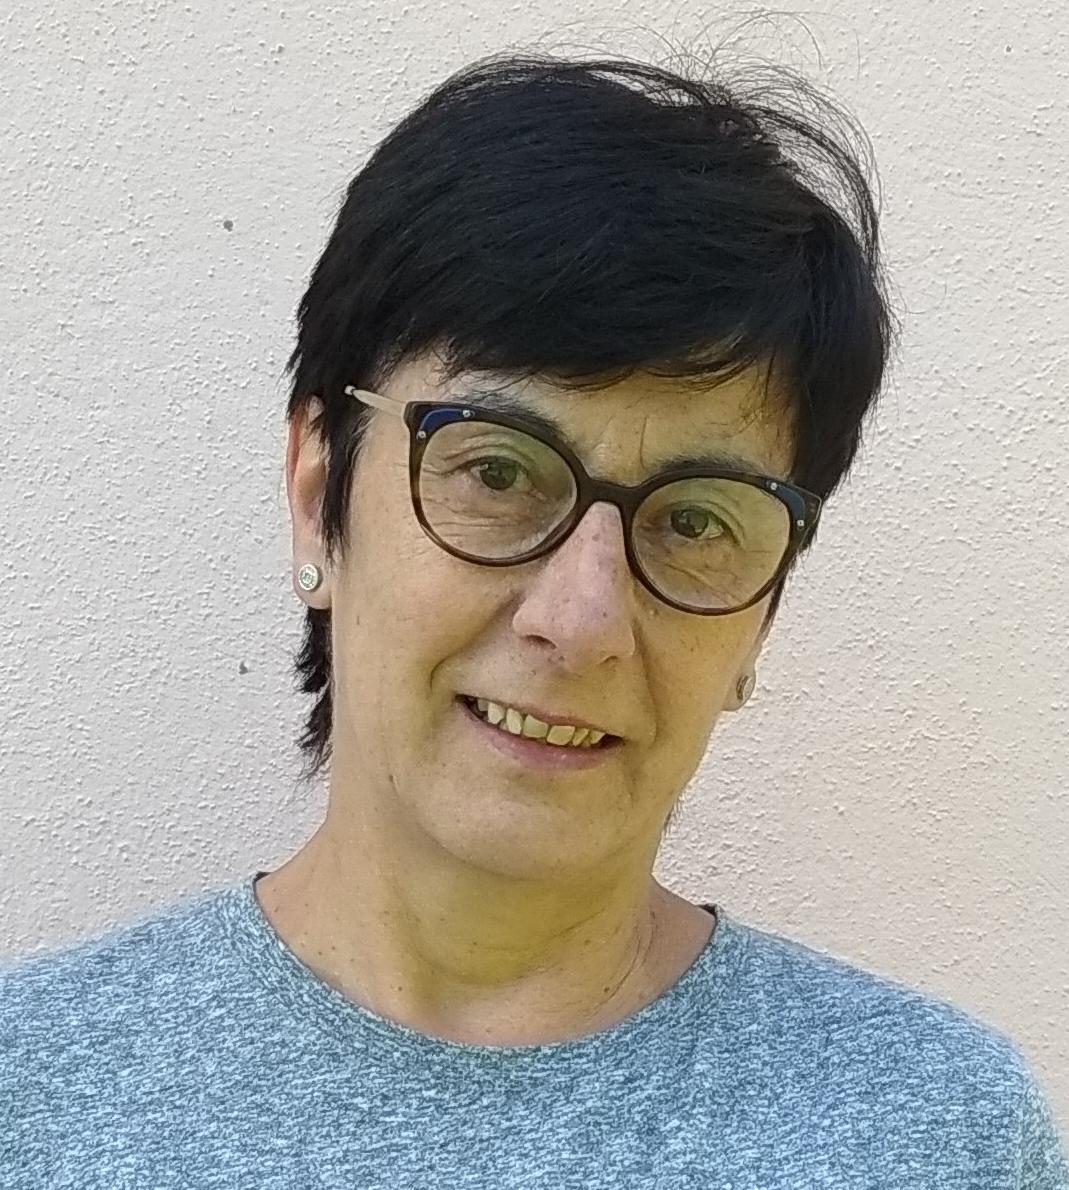 Ana Merino Iriarte